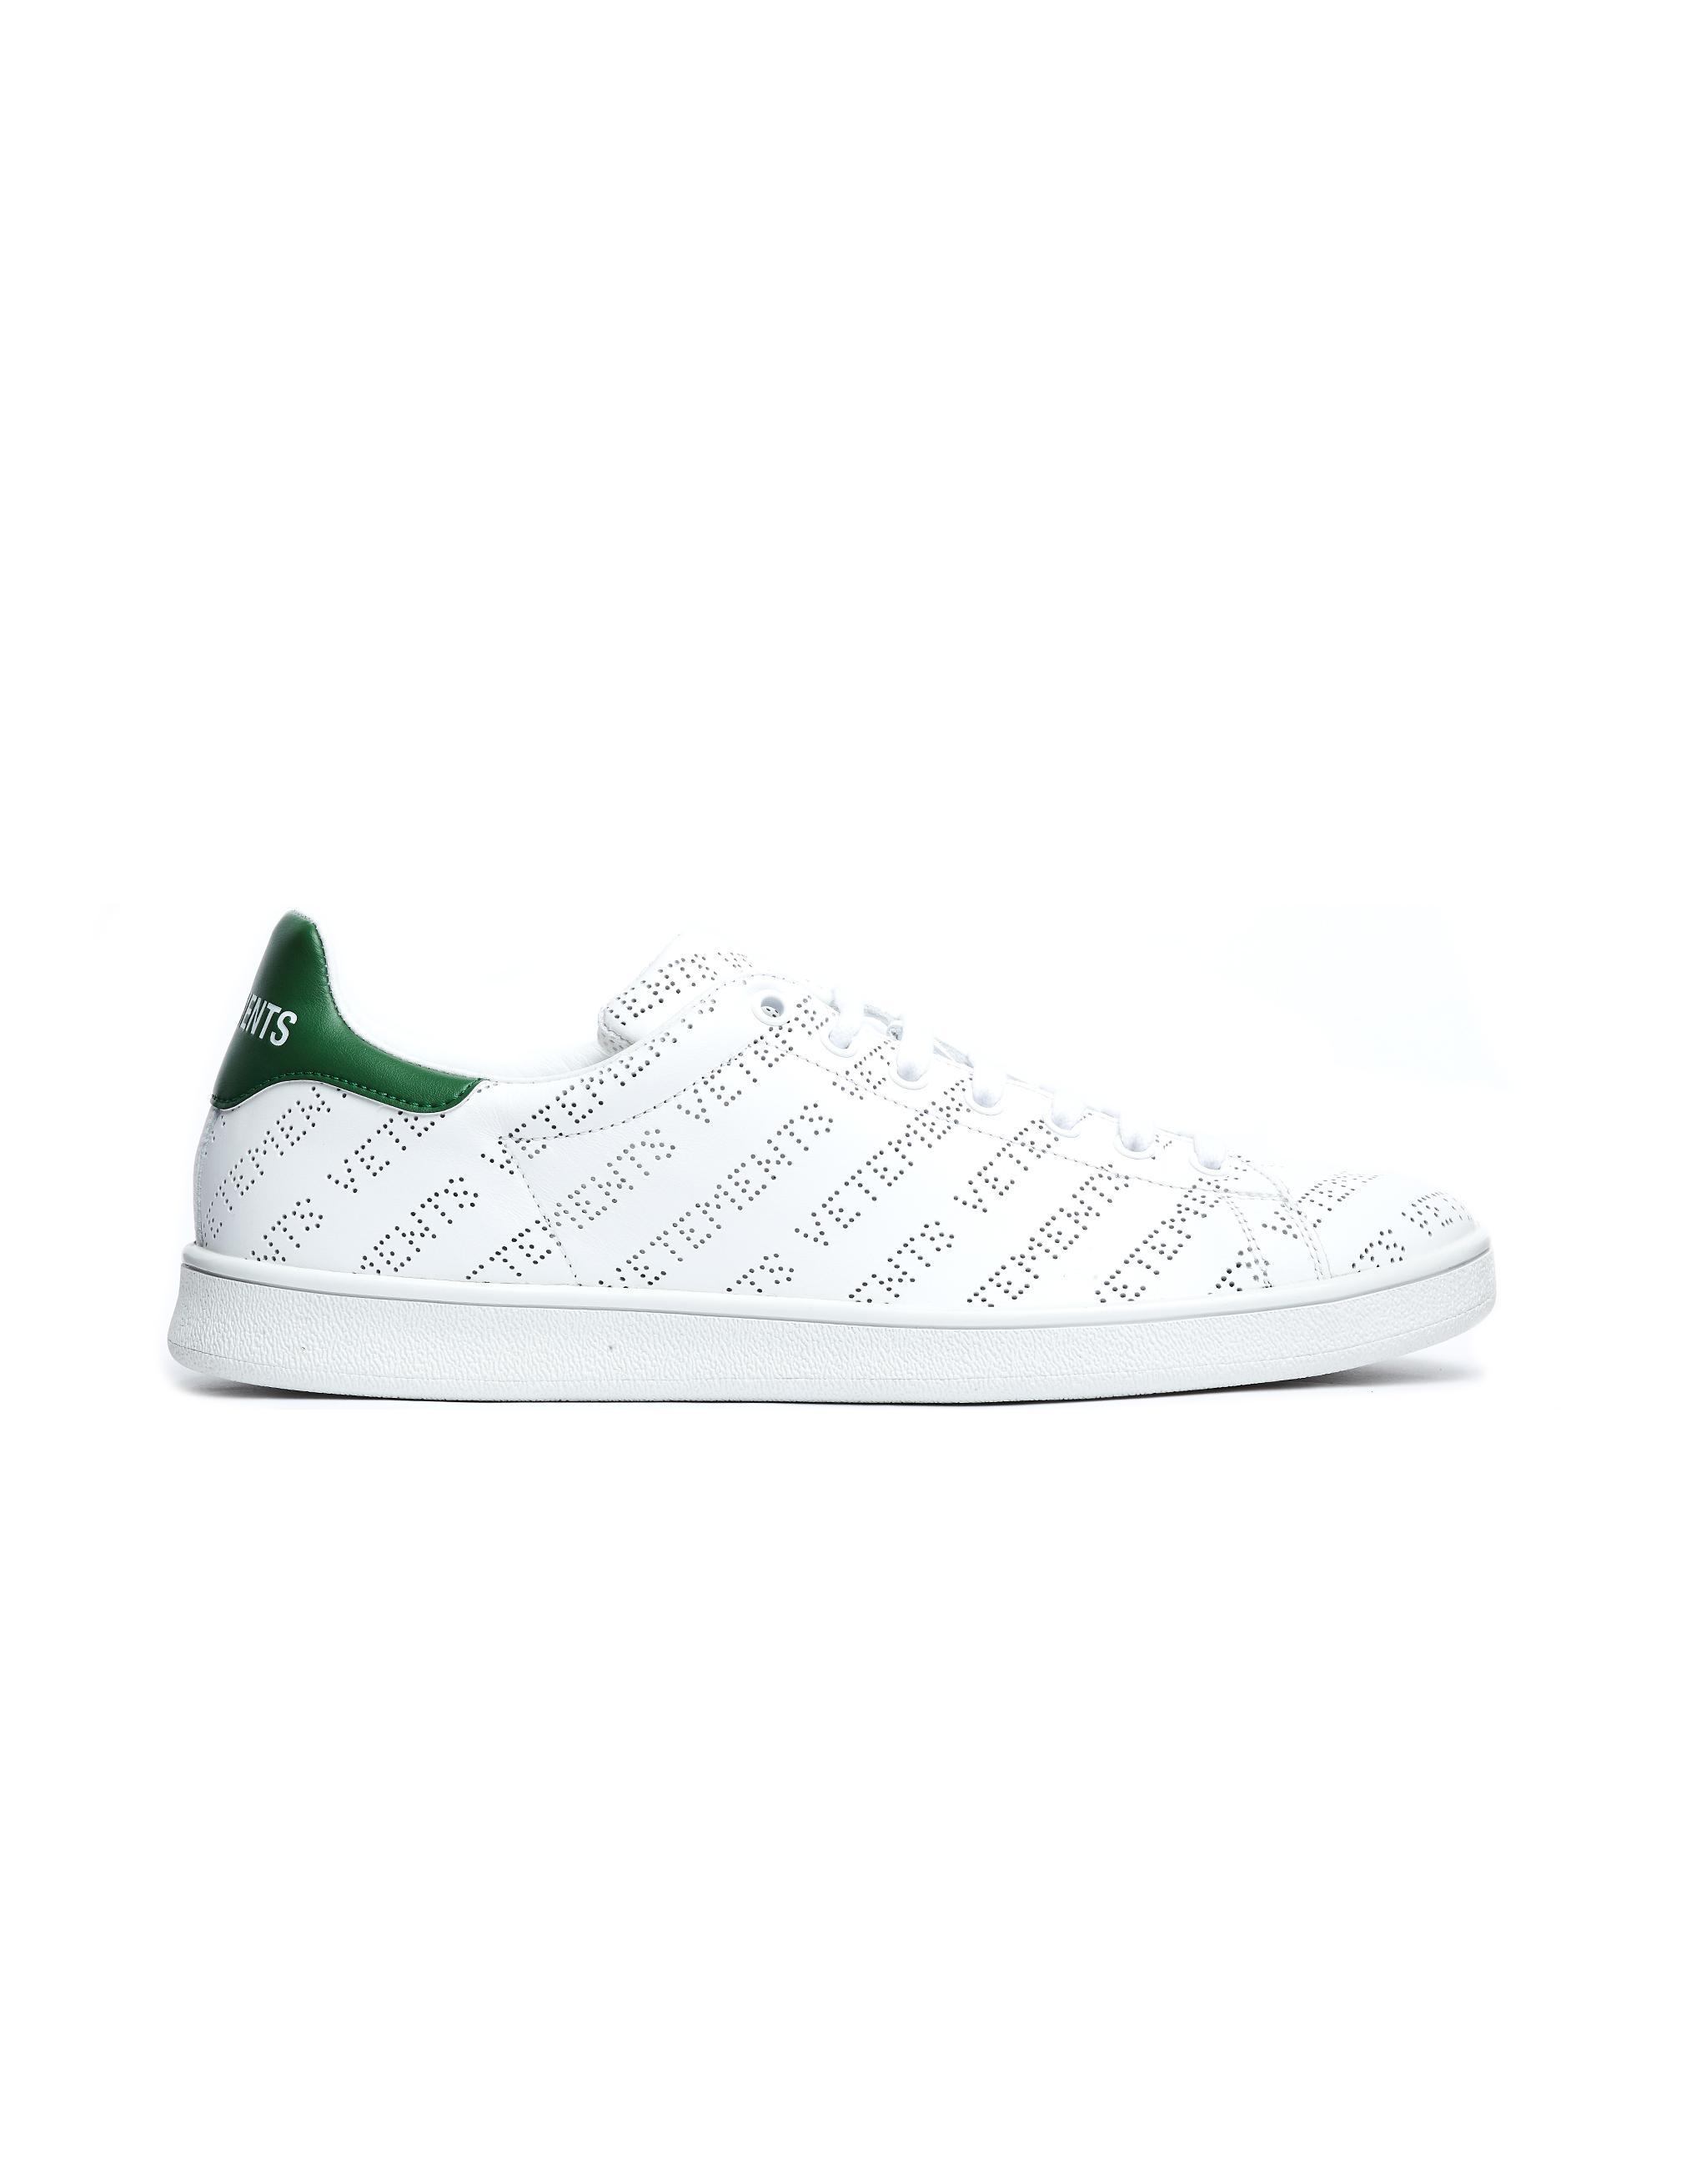 In Low For Sneakers Topsamp; Men Vetements White Save N0OPnwkXZ8